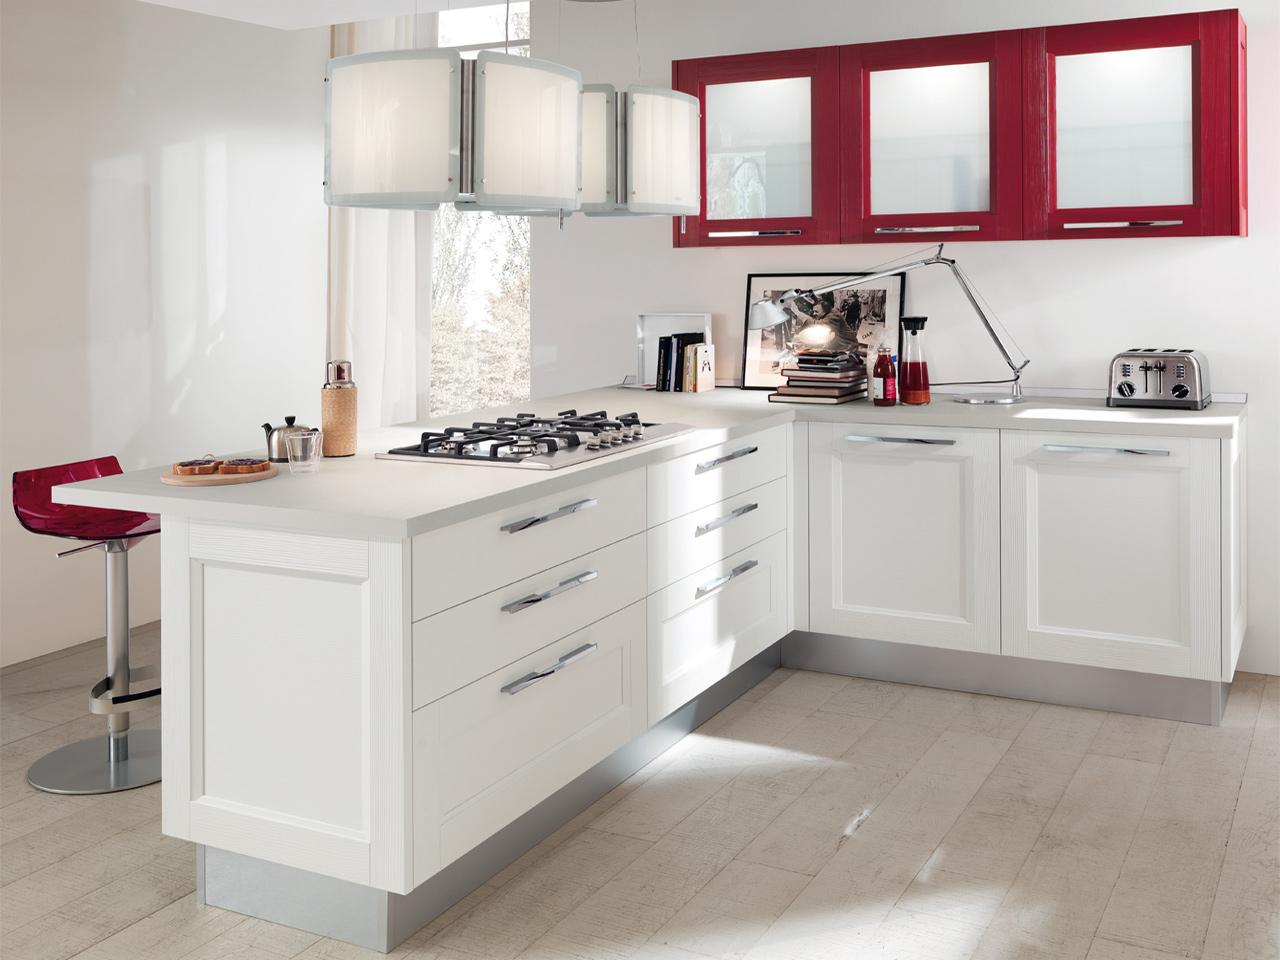 Cucine Componibili Ikea 2013 : Cucine a vista con isola. Cucine a ...